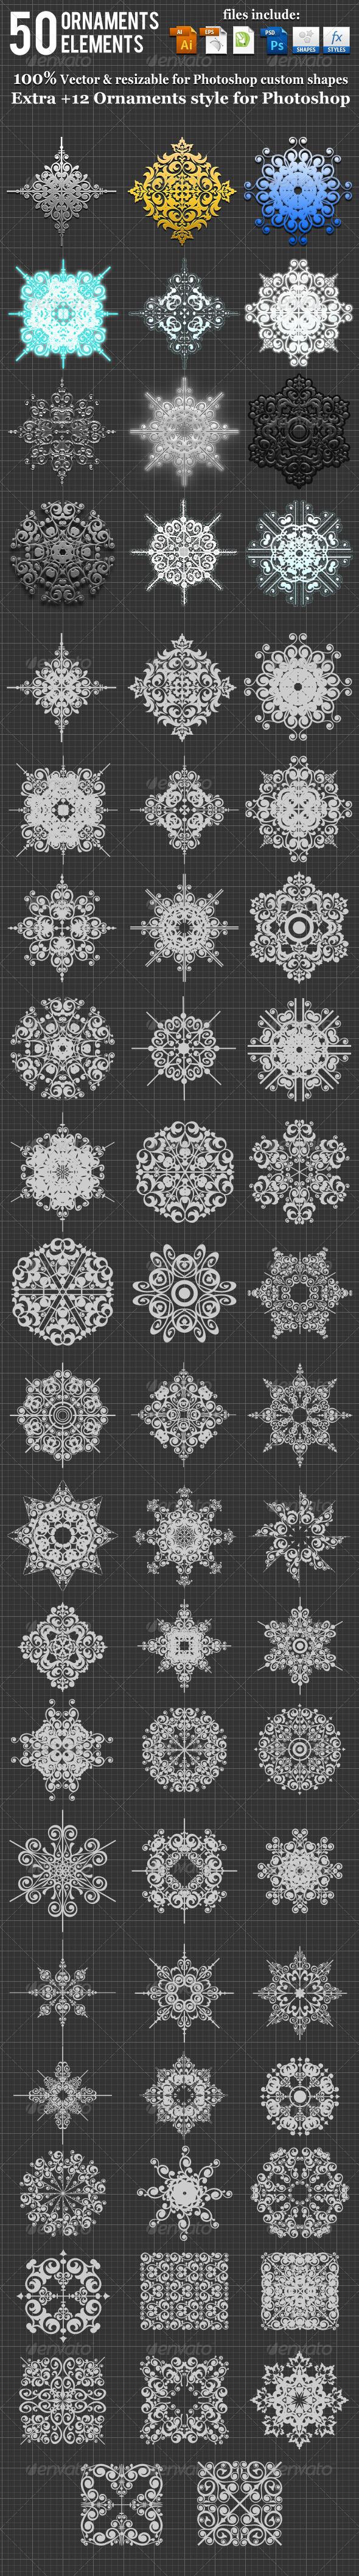 GraphicRiver 50 Ornaments Element Photoshop Custom Shape 3456670